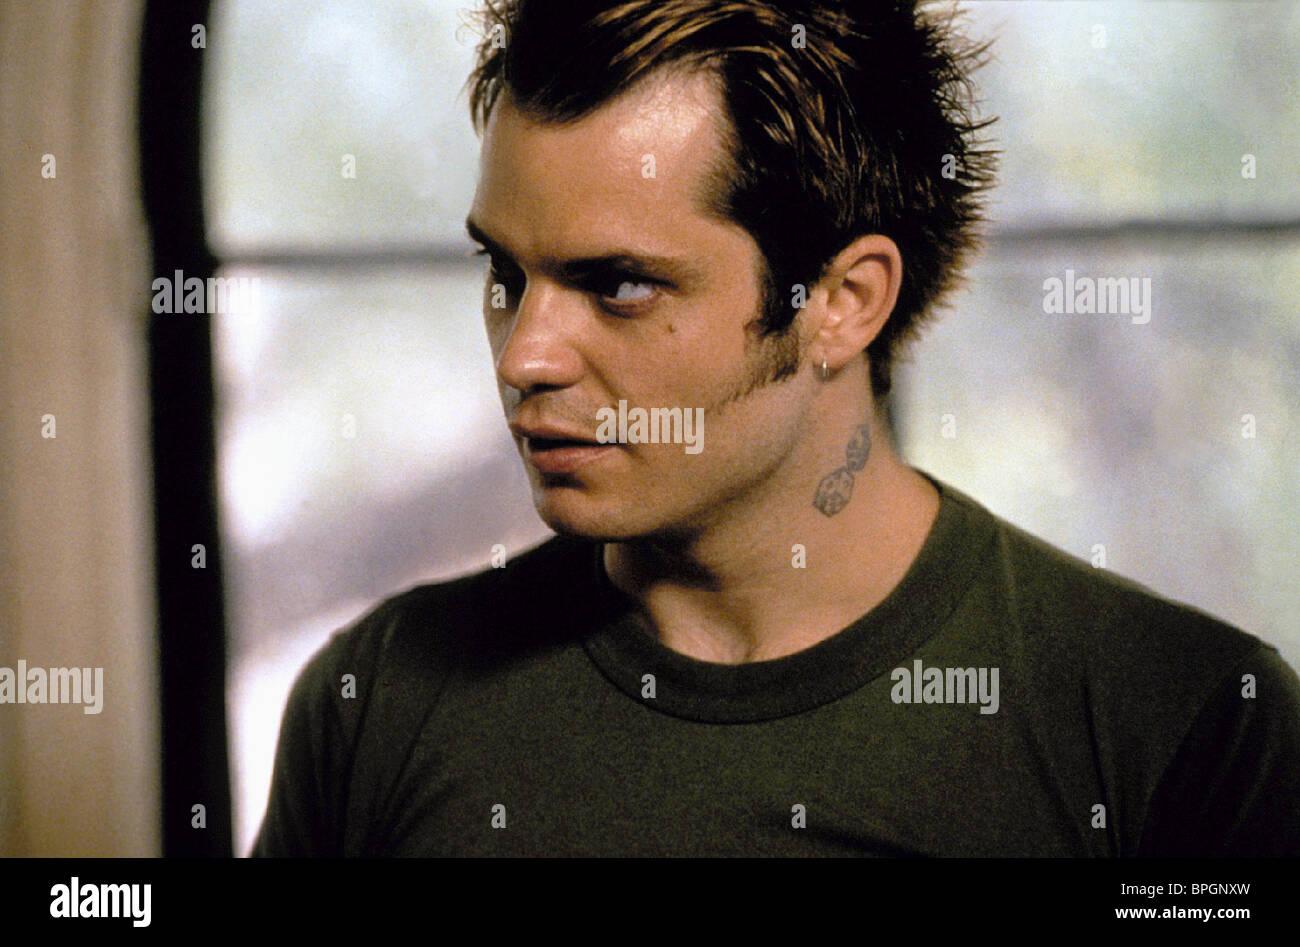 TIMOTHY OLYPHANT GO (1999) - Stock Image